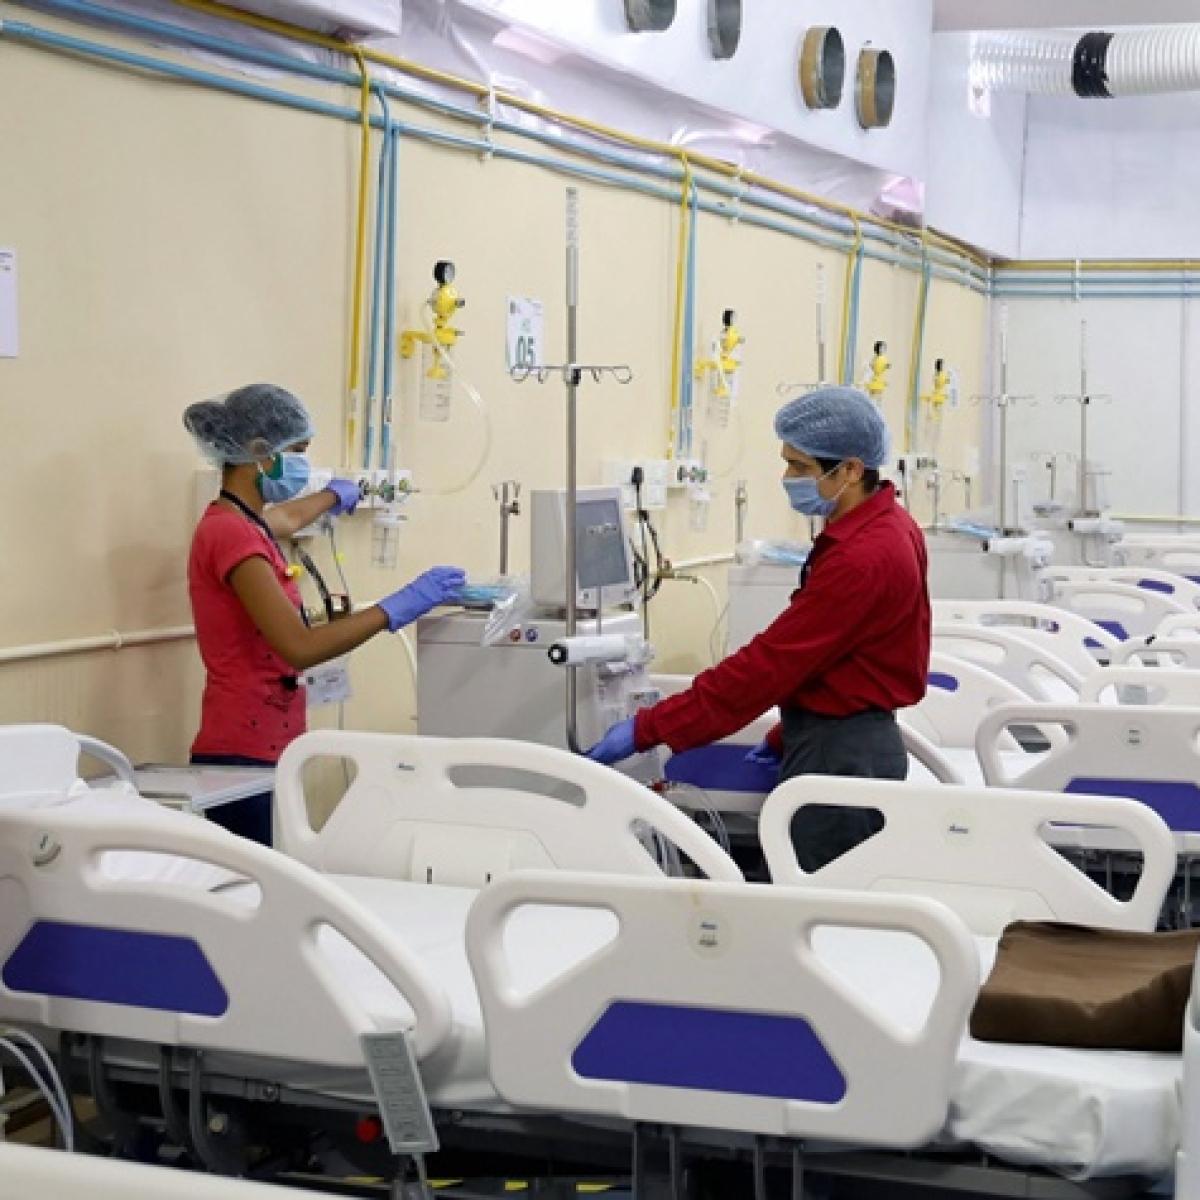 Coronavirus in Mumbai: BMC audit report reveals how Nanavati hospital inflated patient's bill, conducted unnecessary tests